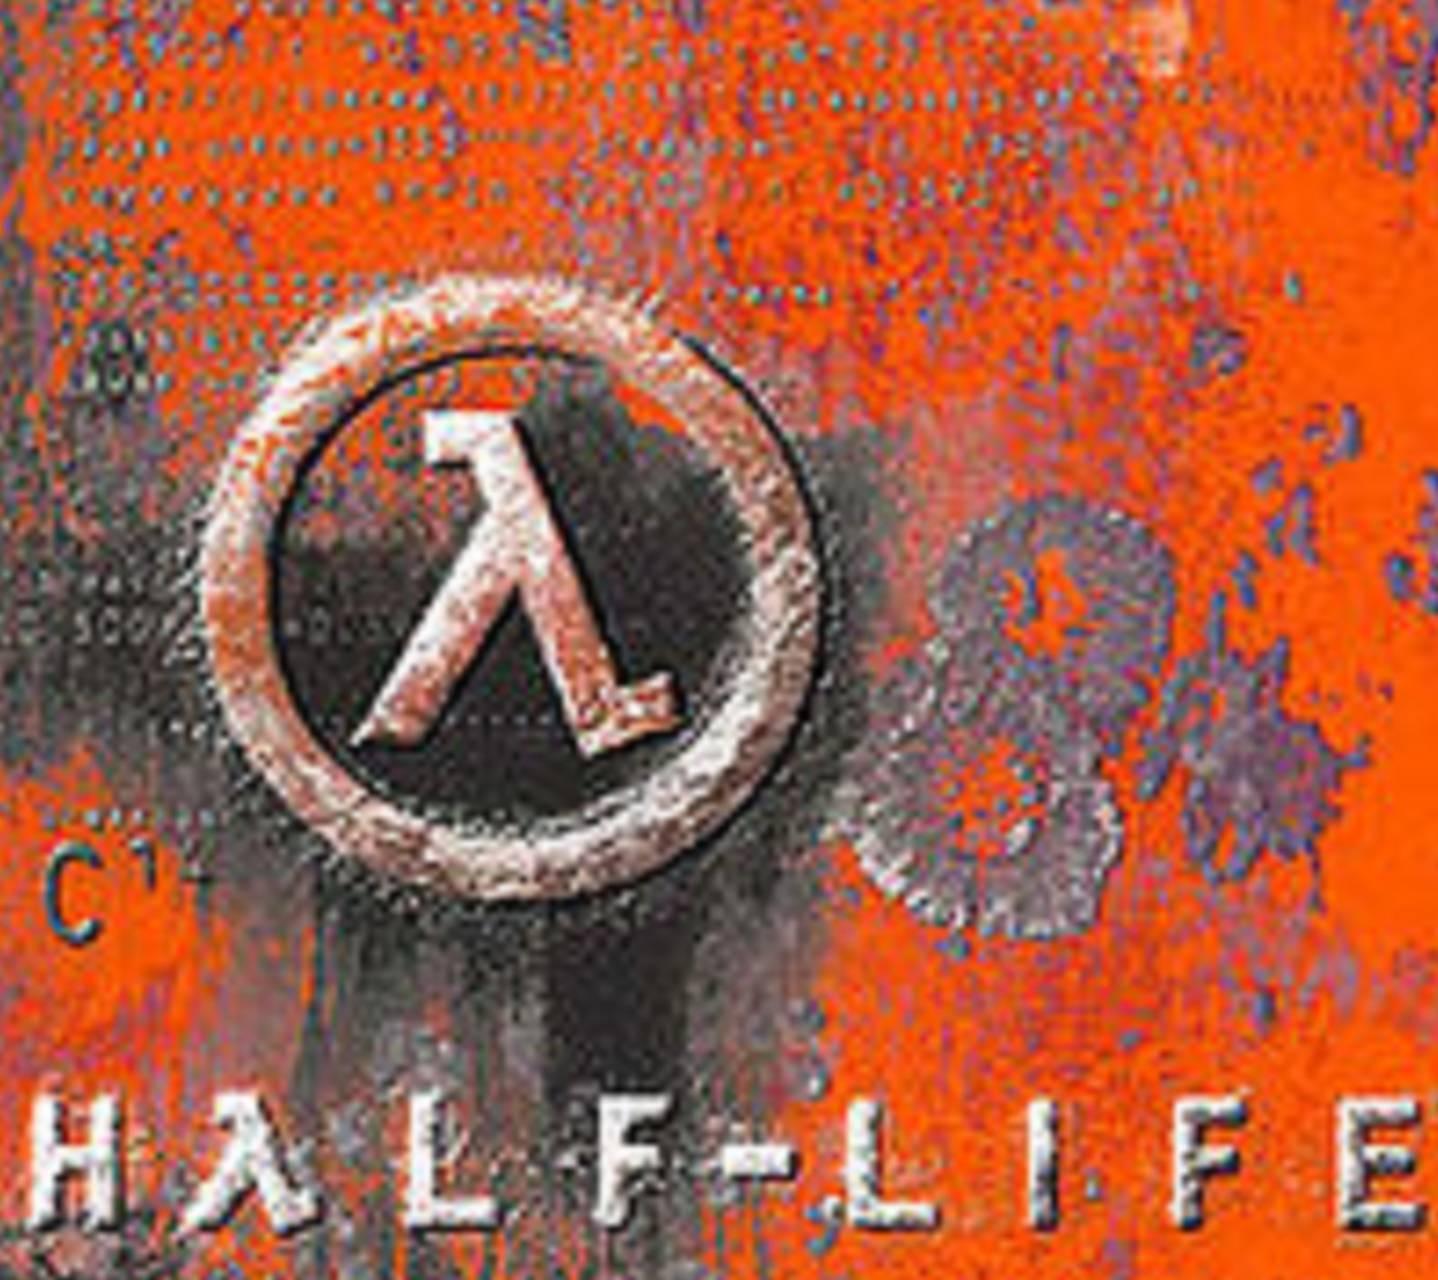 Half-Life 1 box art